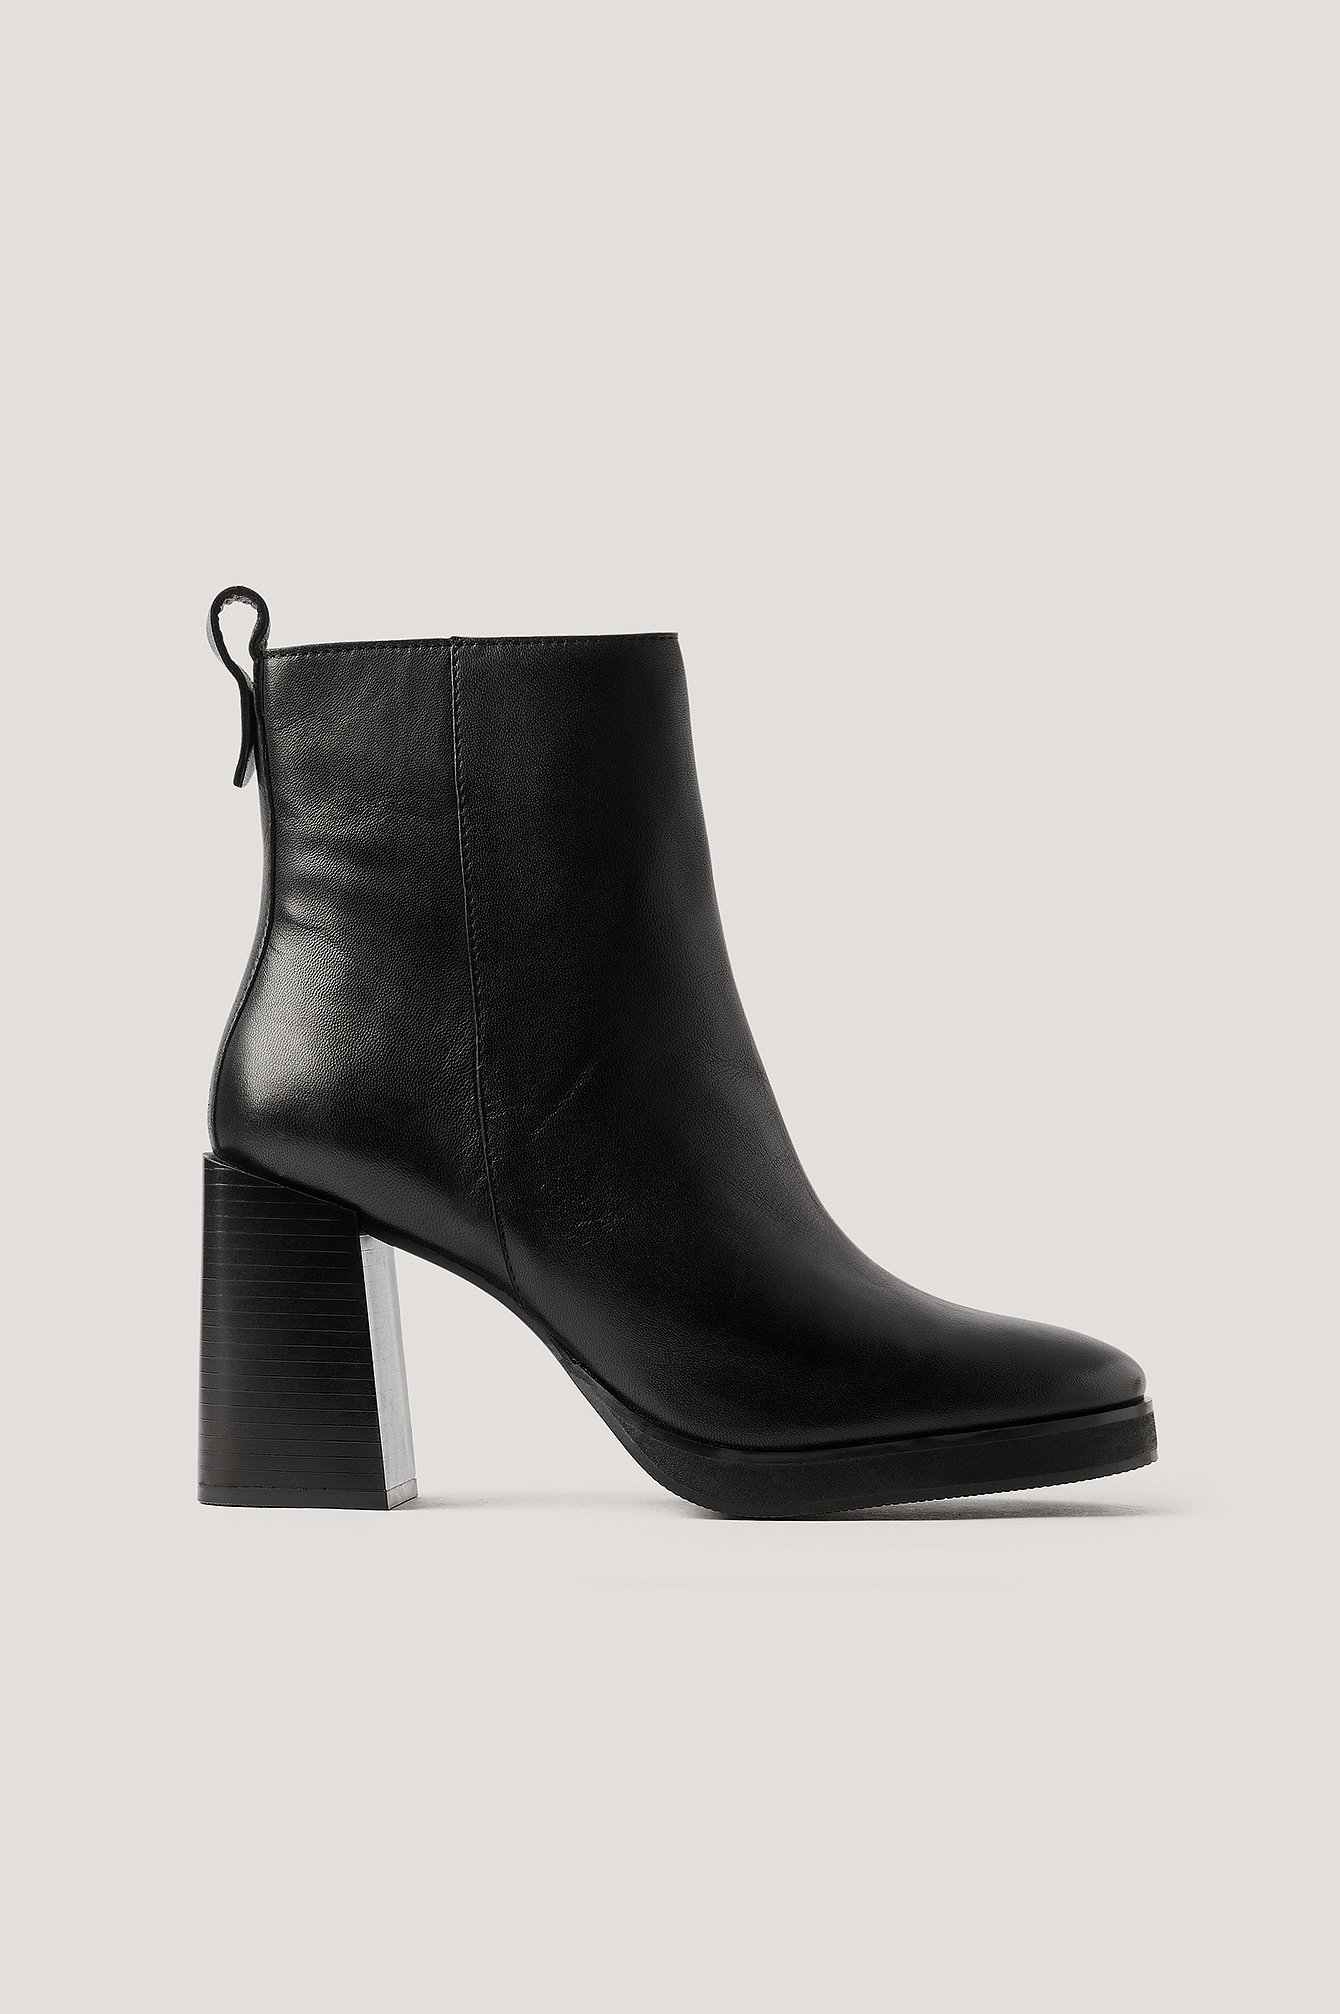 NA-KD Shoes Nahkasaappaat Platform-Pohjalla - Black